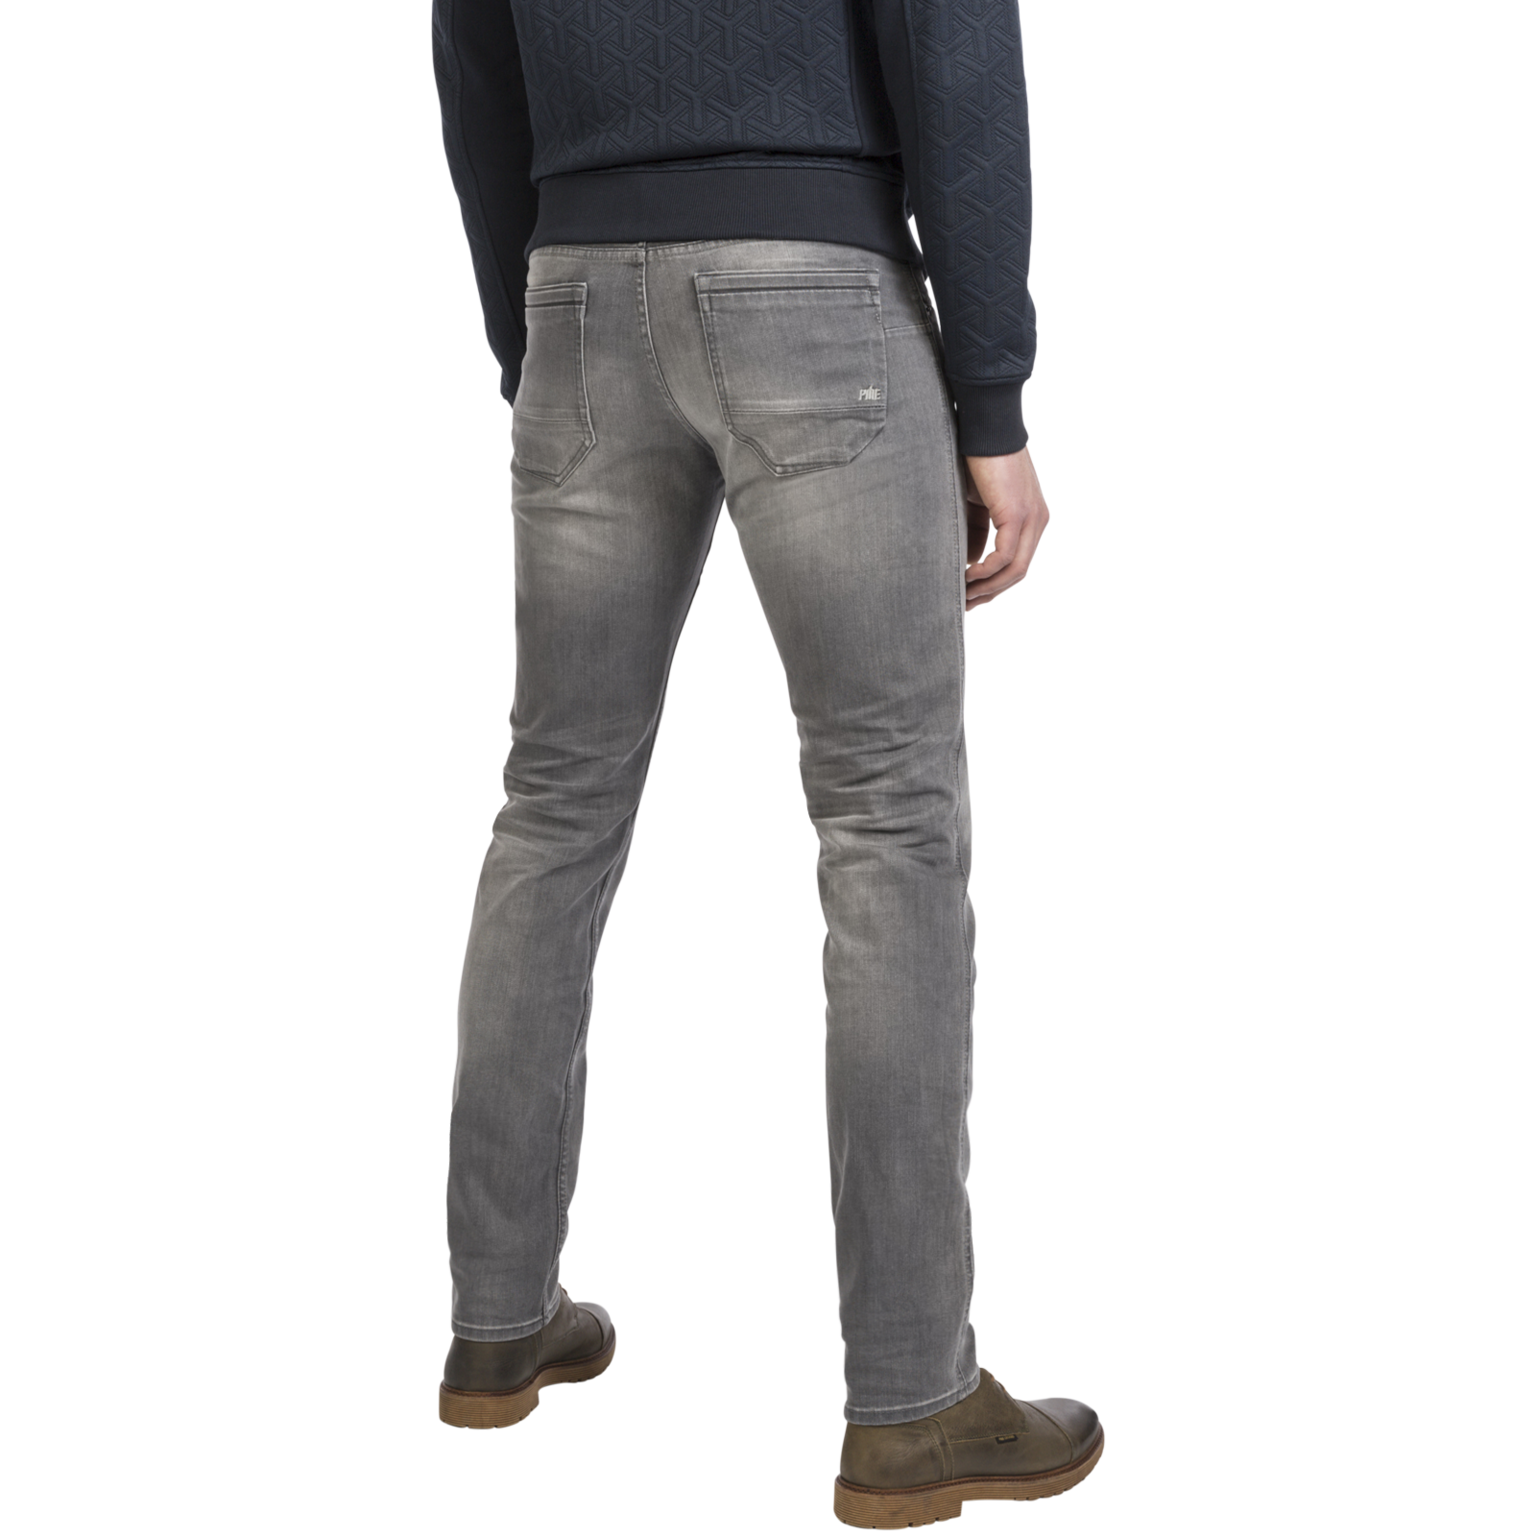 PME Legend Jeans Nightflight